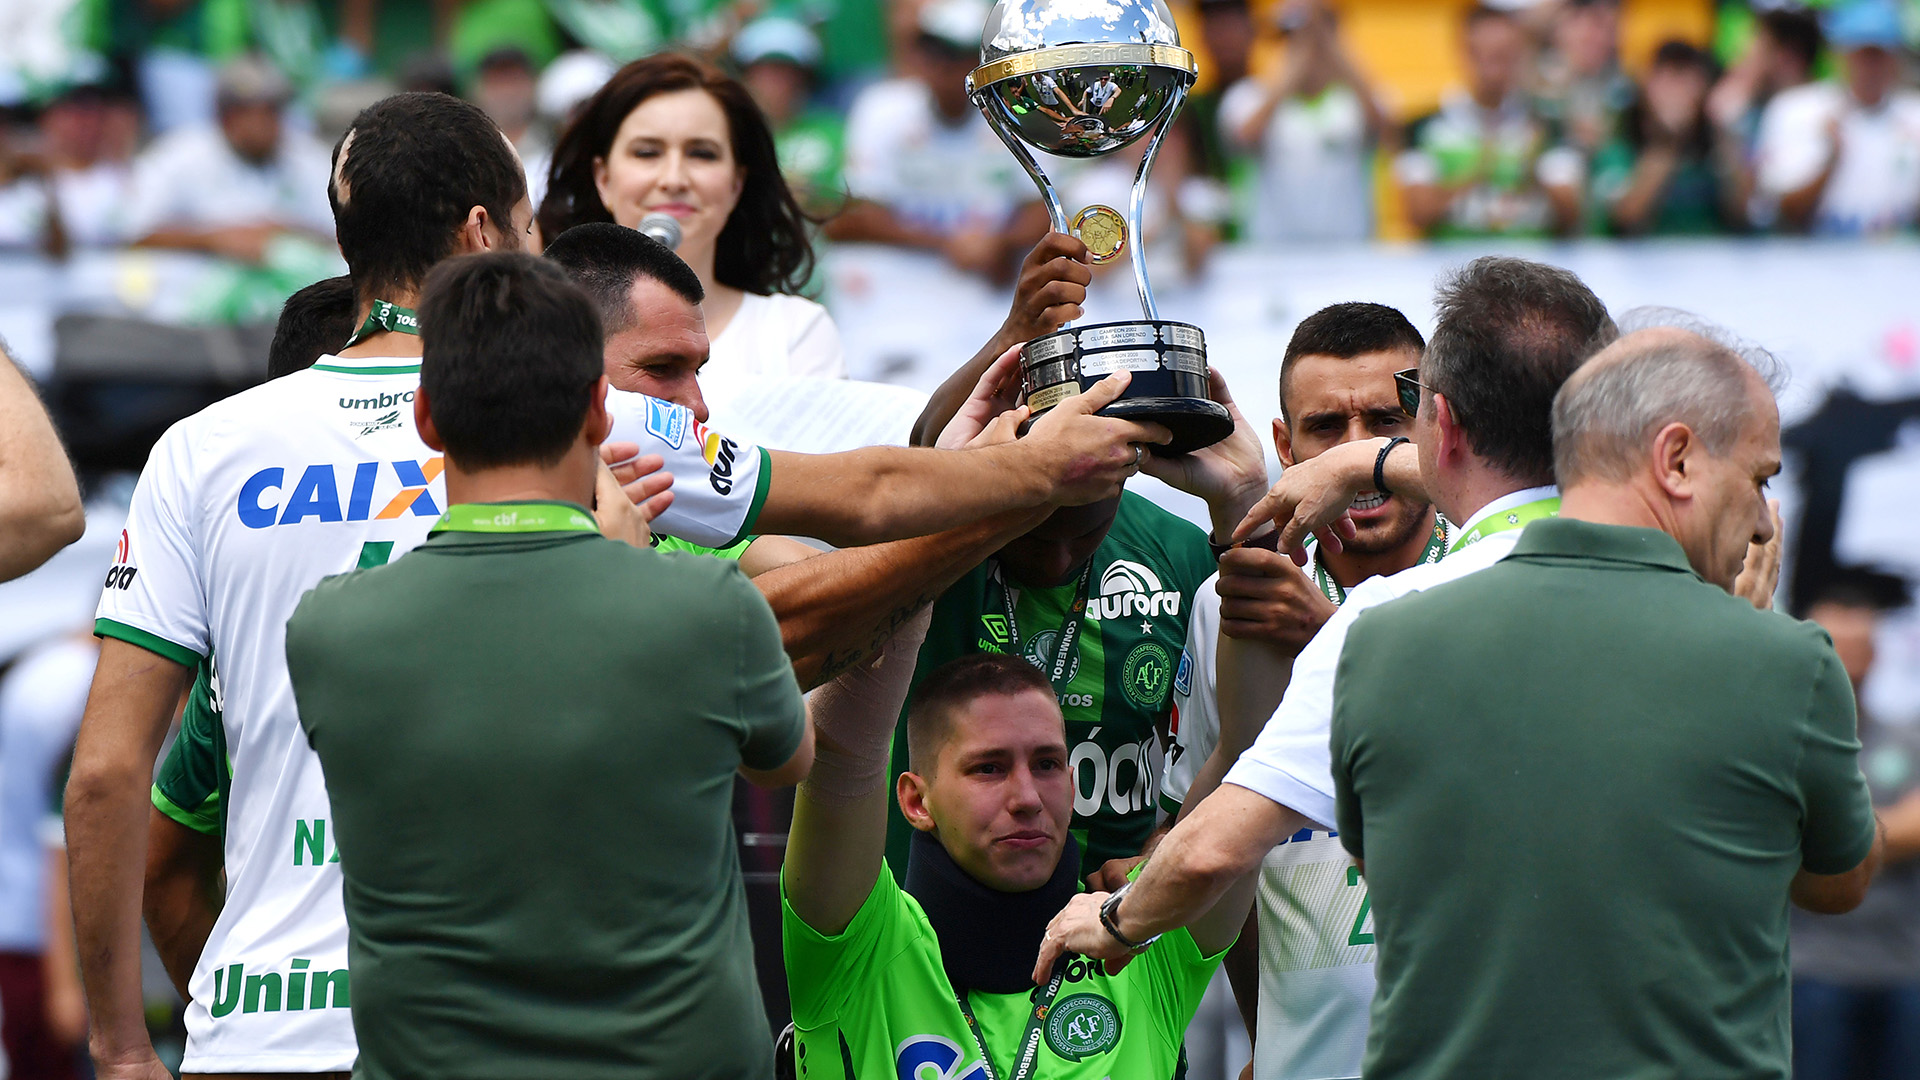 Follmann Copa Sudamericana trofeu Palmeiras Chapecoense Amistoso homenagem 21012017